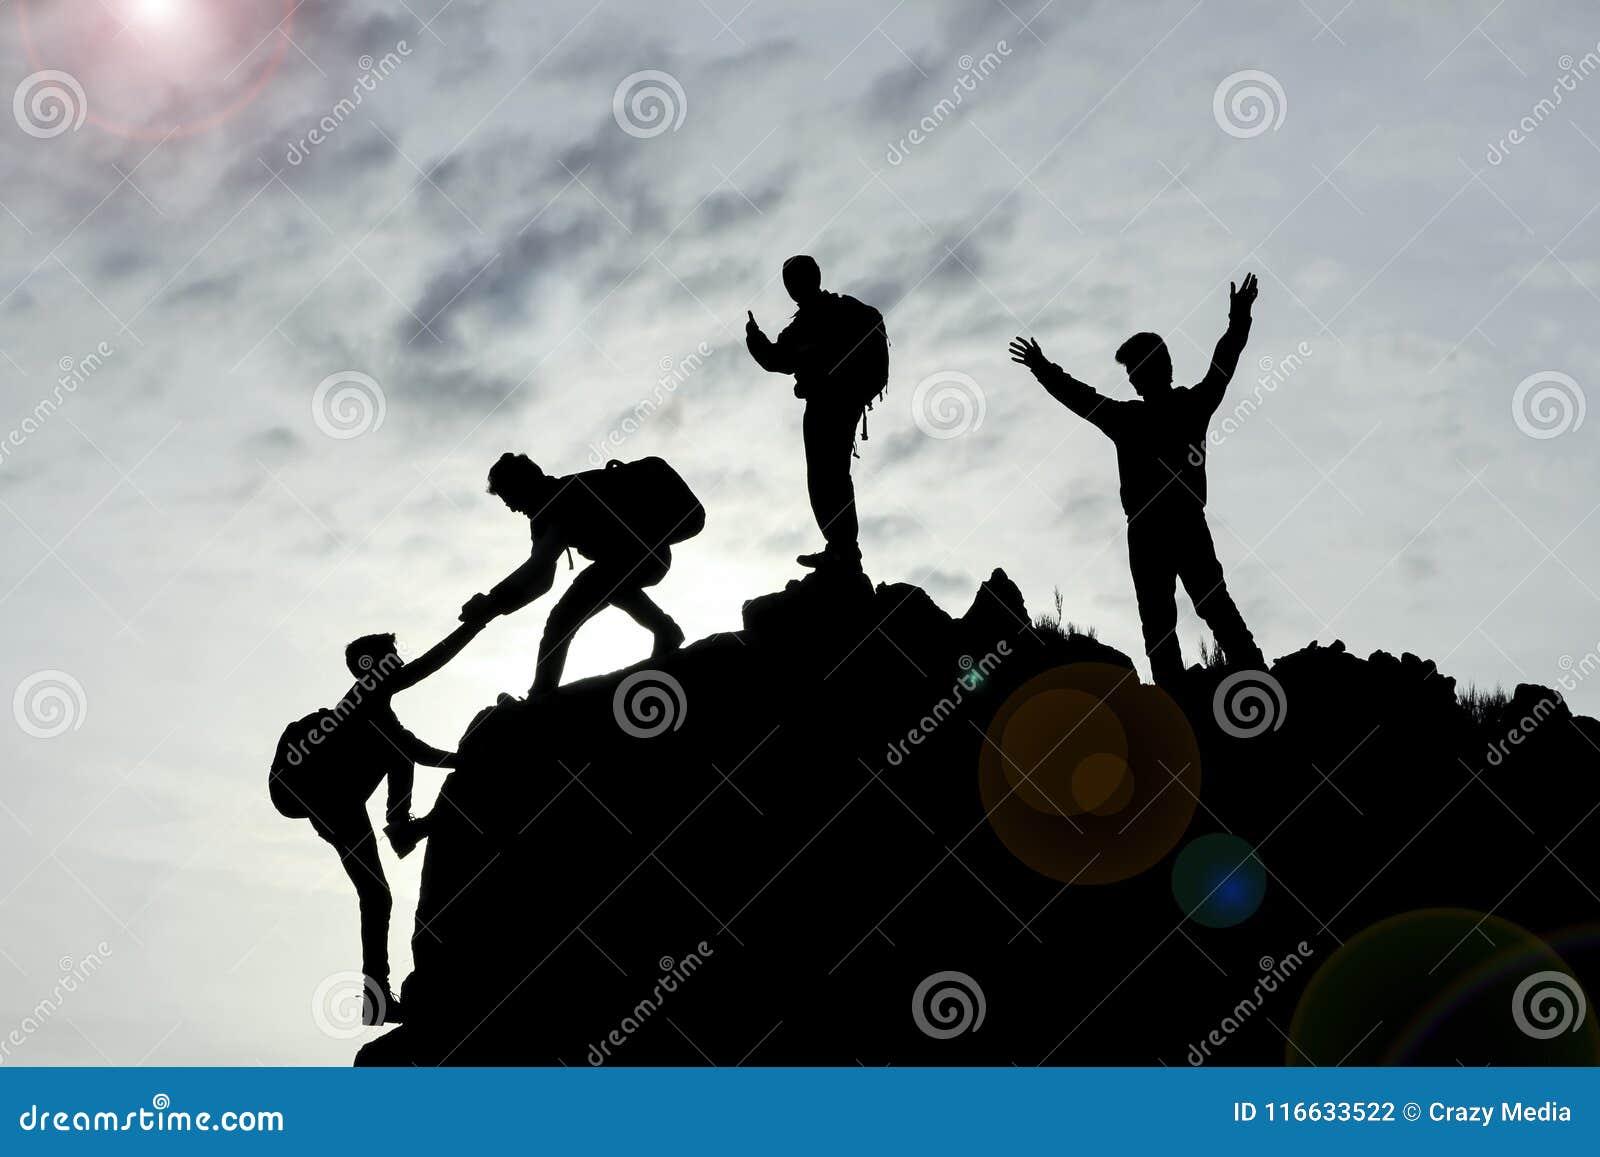 Groepswerk en succes met eenheid en samenwerking